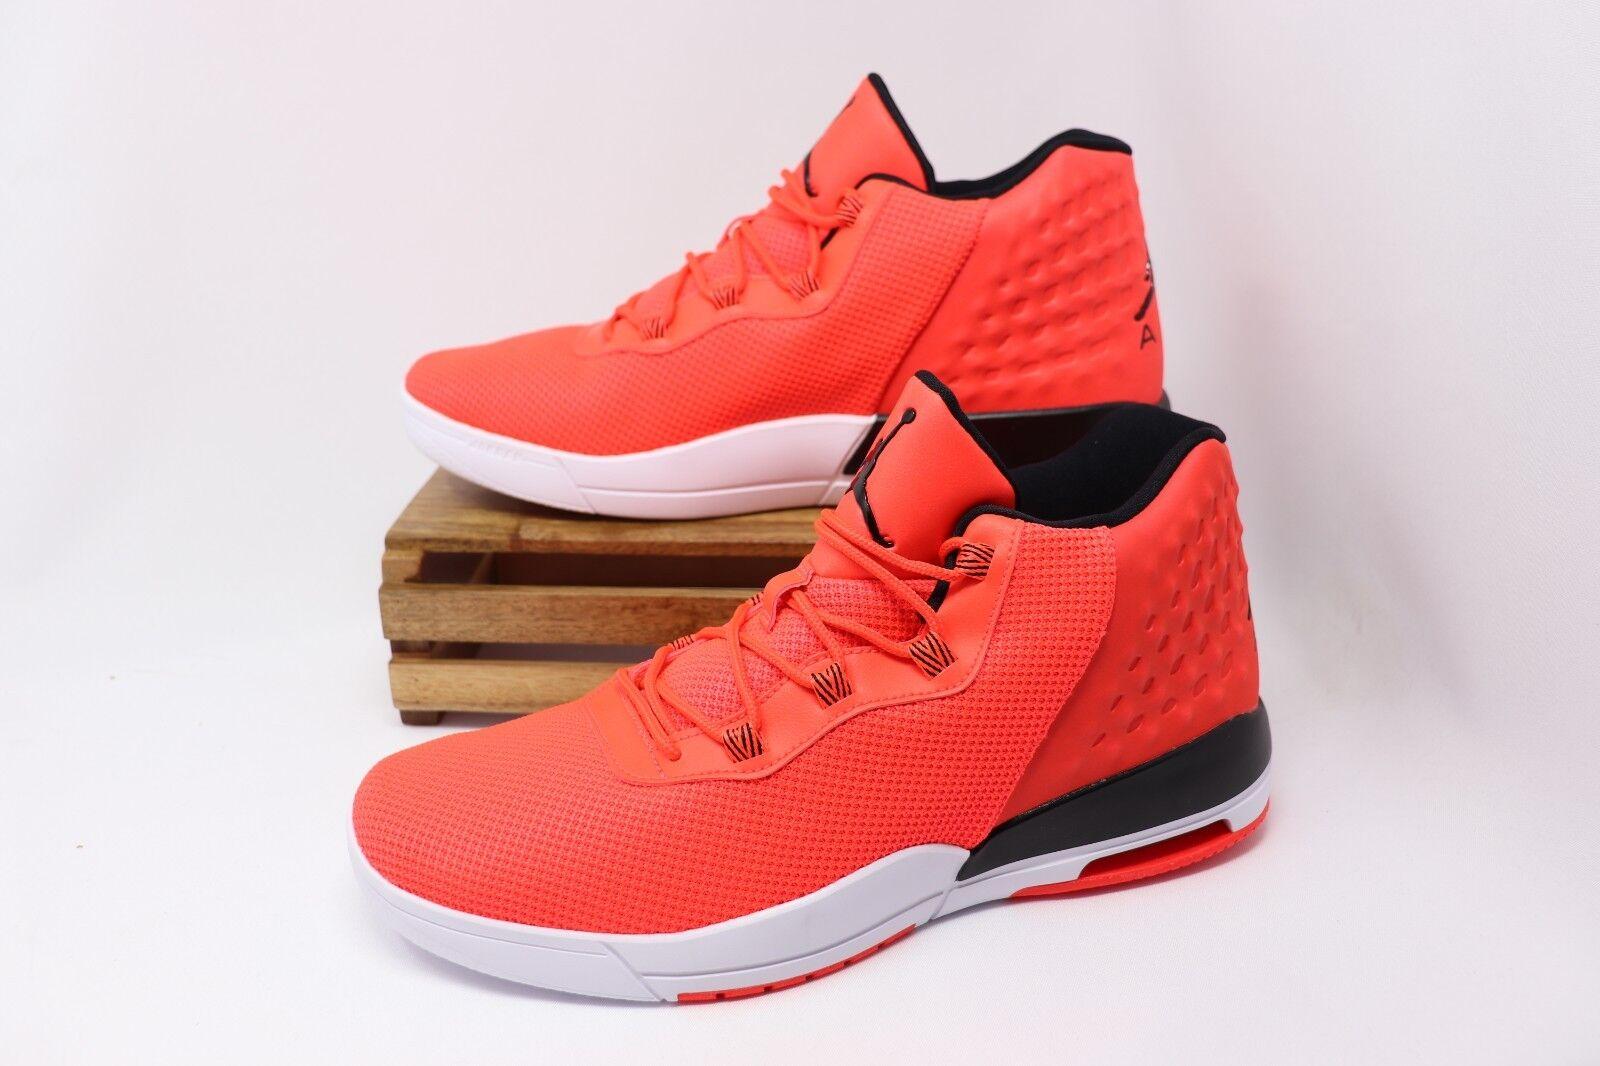 Nike Air Jordan Academy Basketball shoes Infrared White 844515-605 Men's NEW